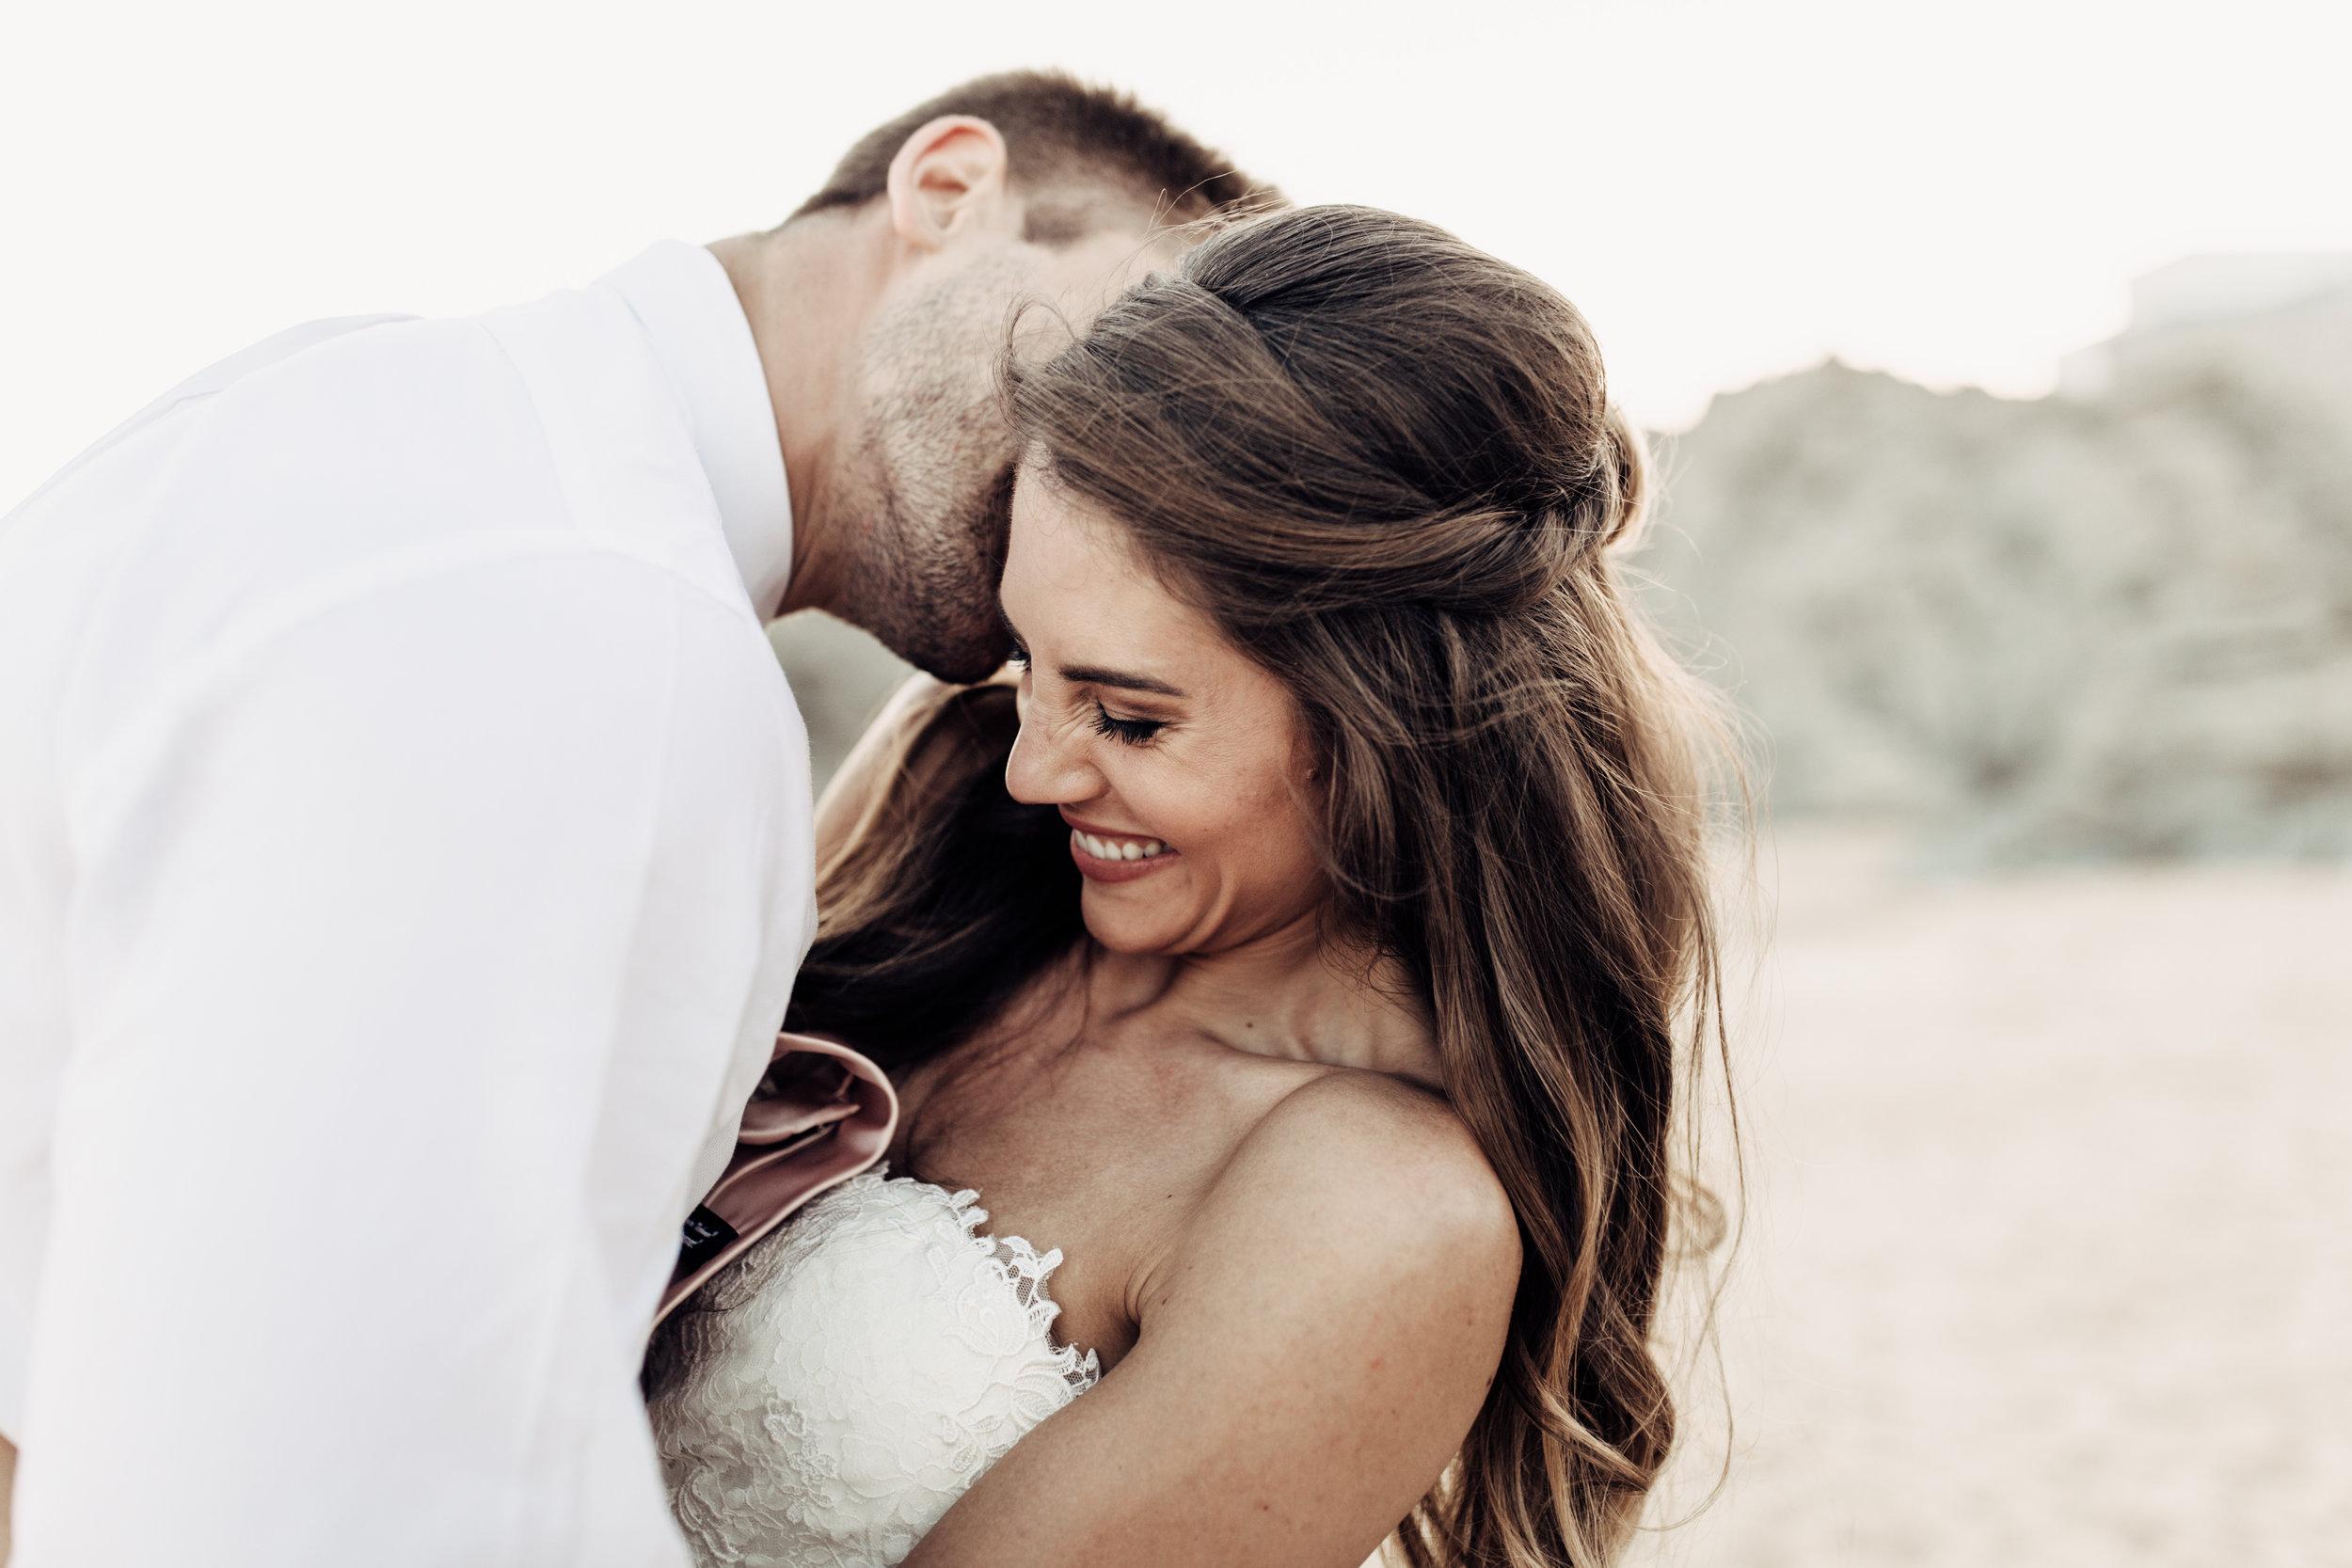 pueblo-bonito-sunset-beach-wedding-cabo-san-lucas543.jpg